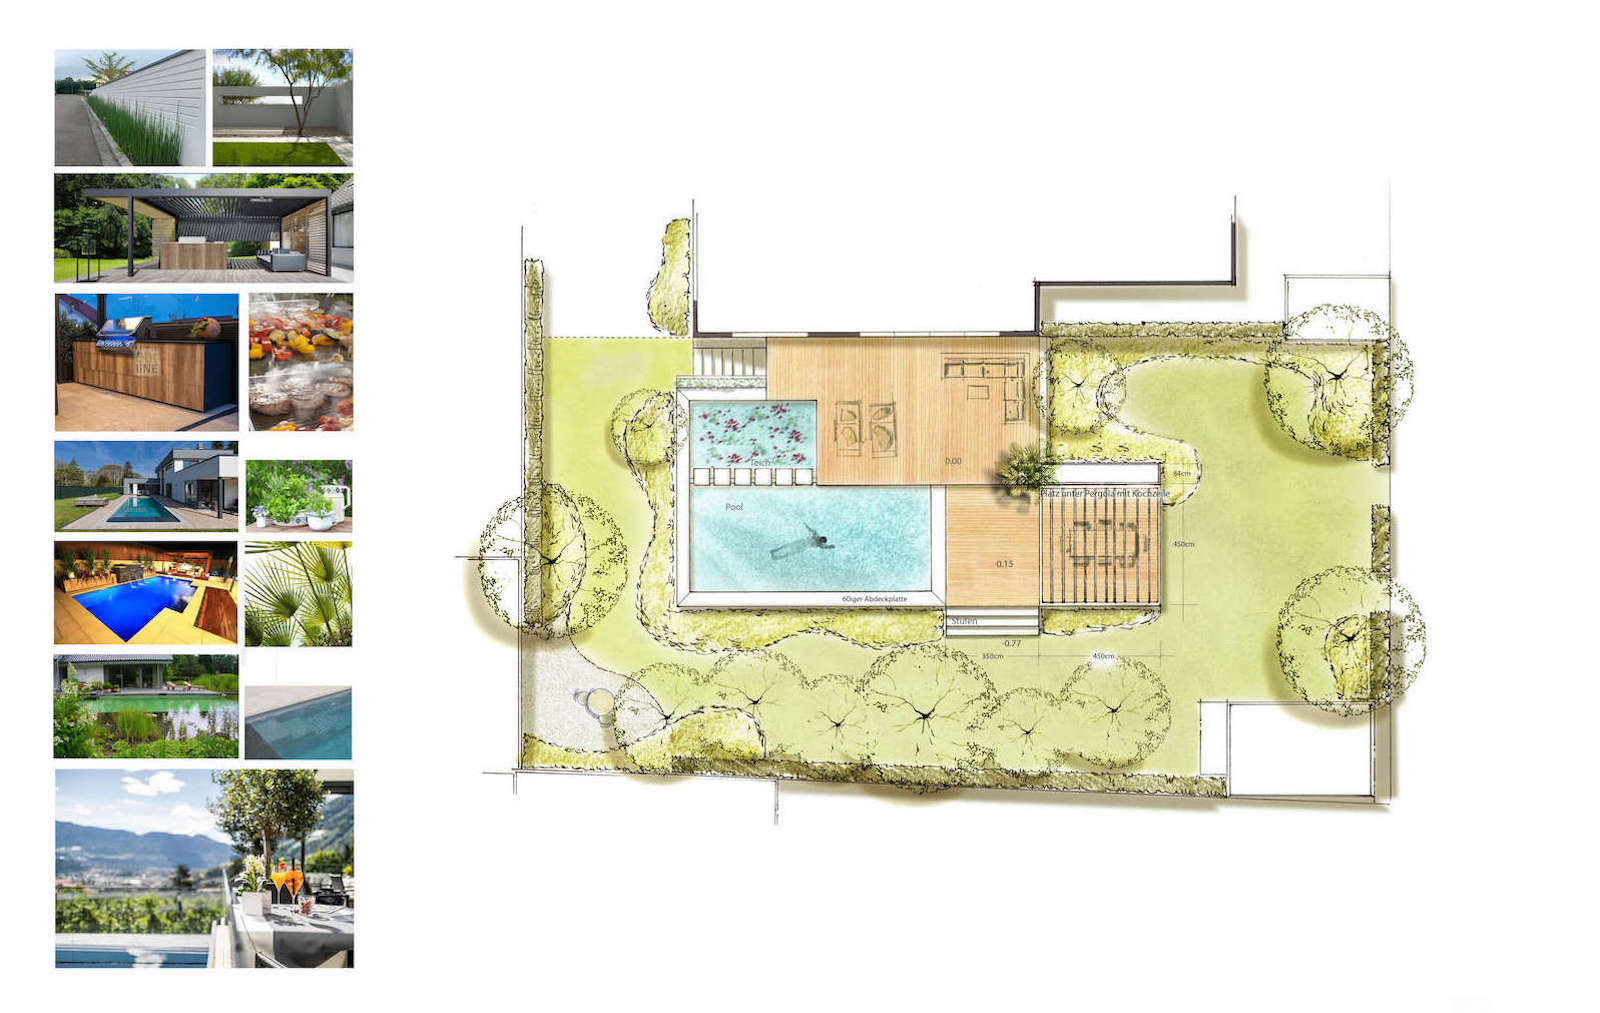 Hainmüller Gartengestaltung 4 -K